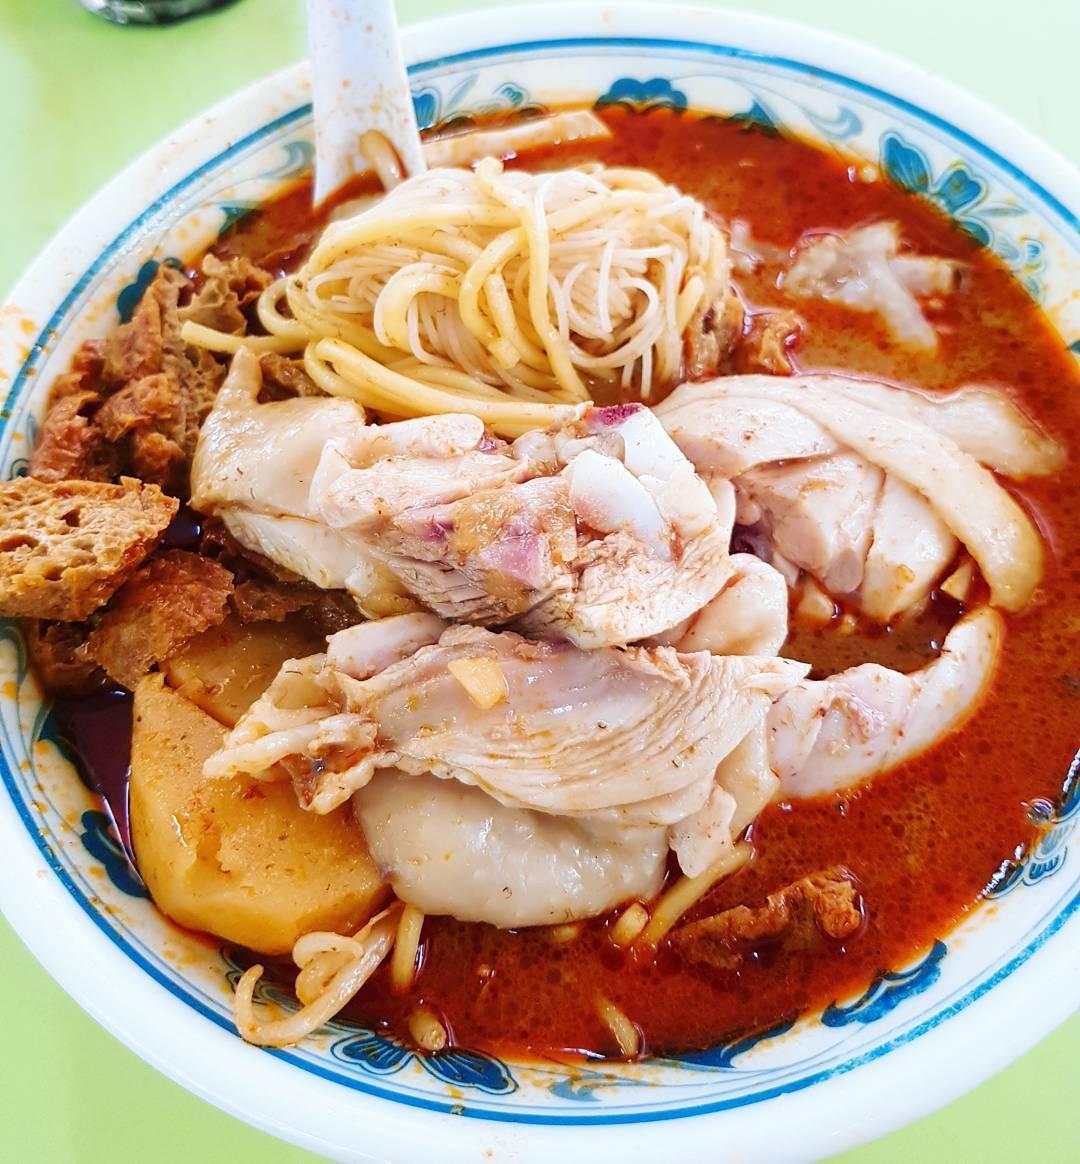 Hong Lim Food Centre - Heng Kee Curry Chicken Bee Hoon Mee